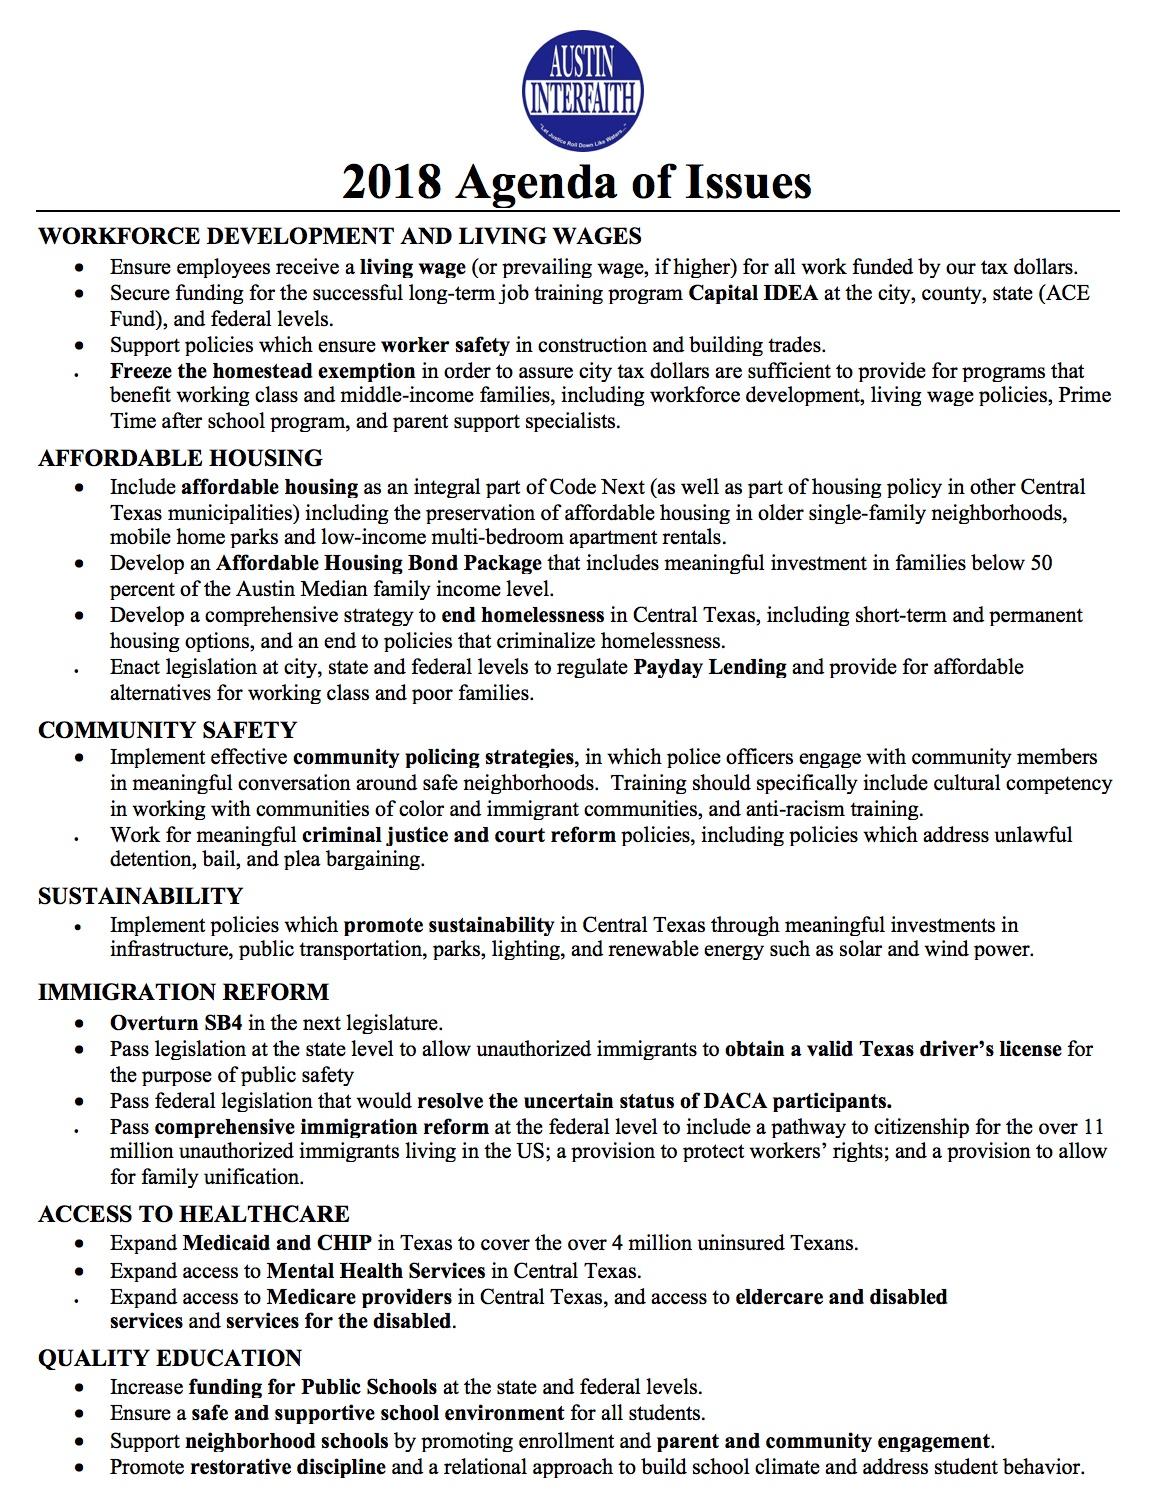 1806_-_ATX_-_Agenda_of_Issues_-_Image.jpeg